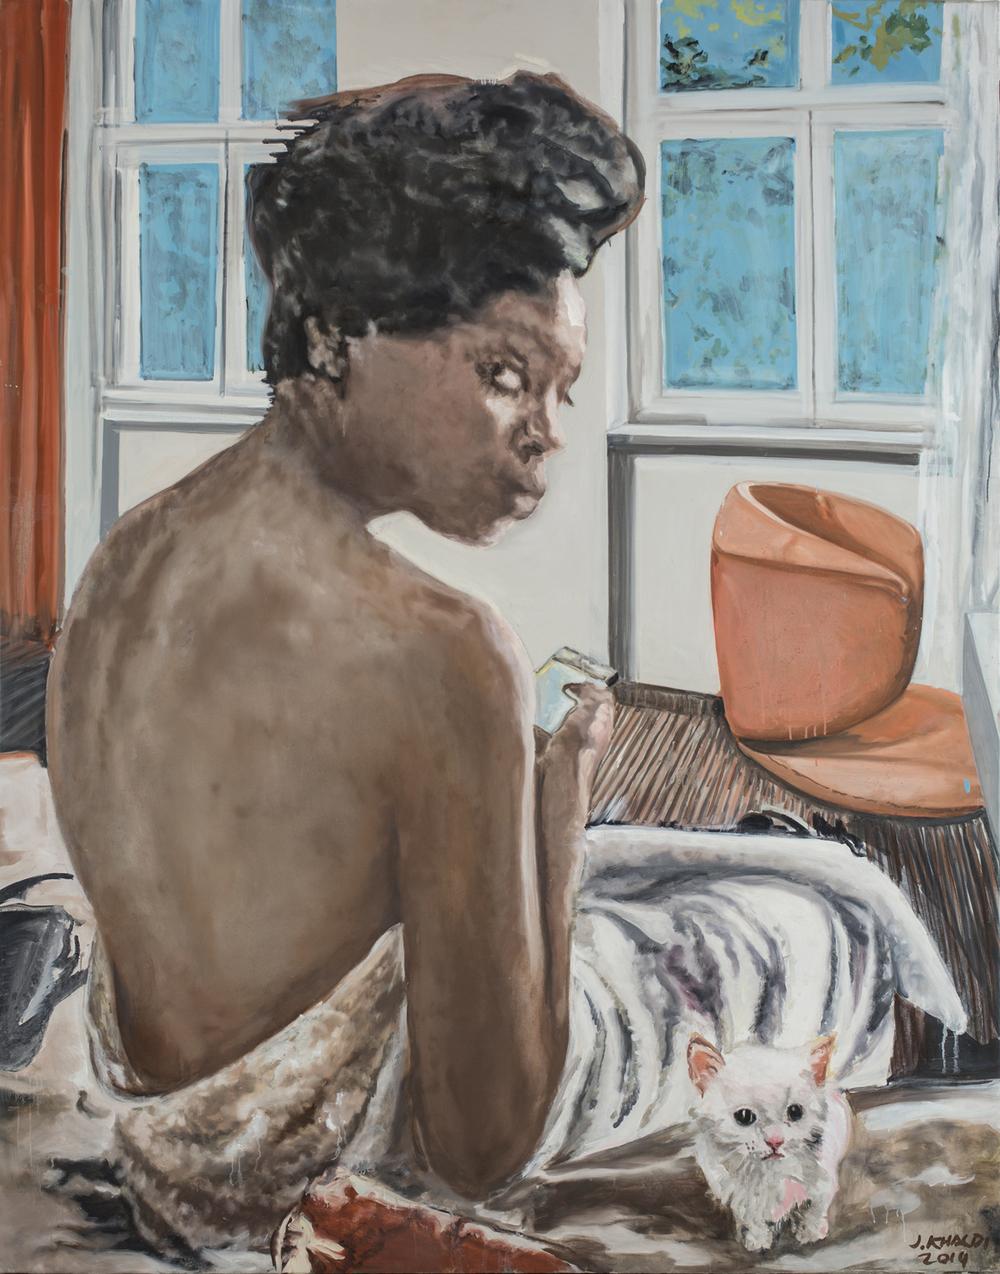 Nicole (2013-14), Oil on canvas, 230 * 180 cm.jpg